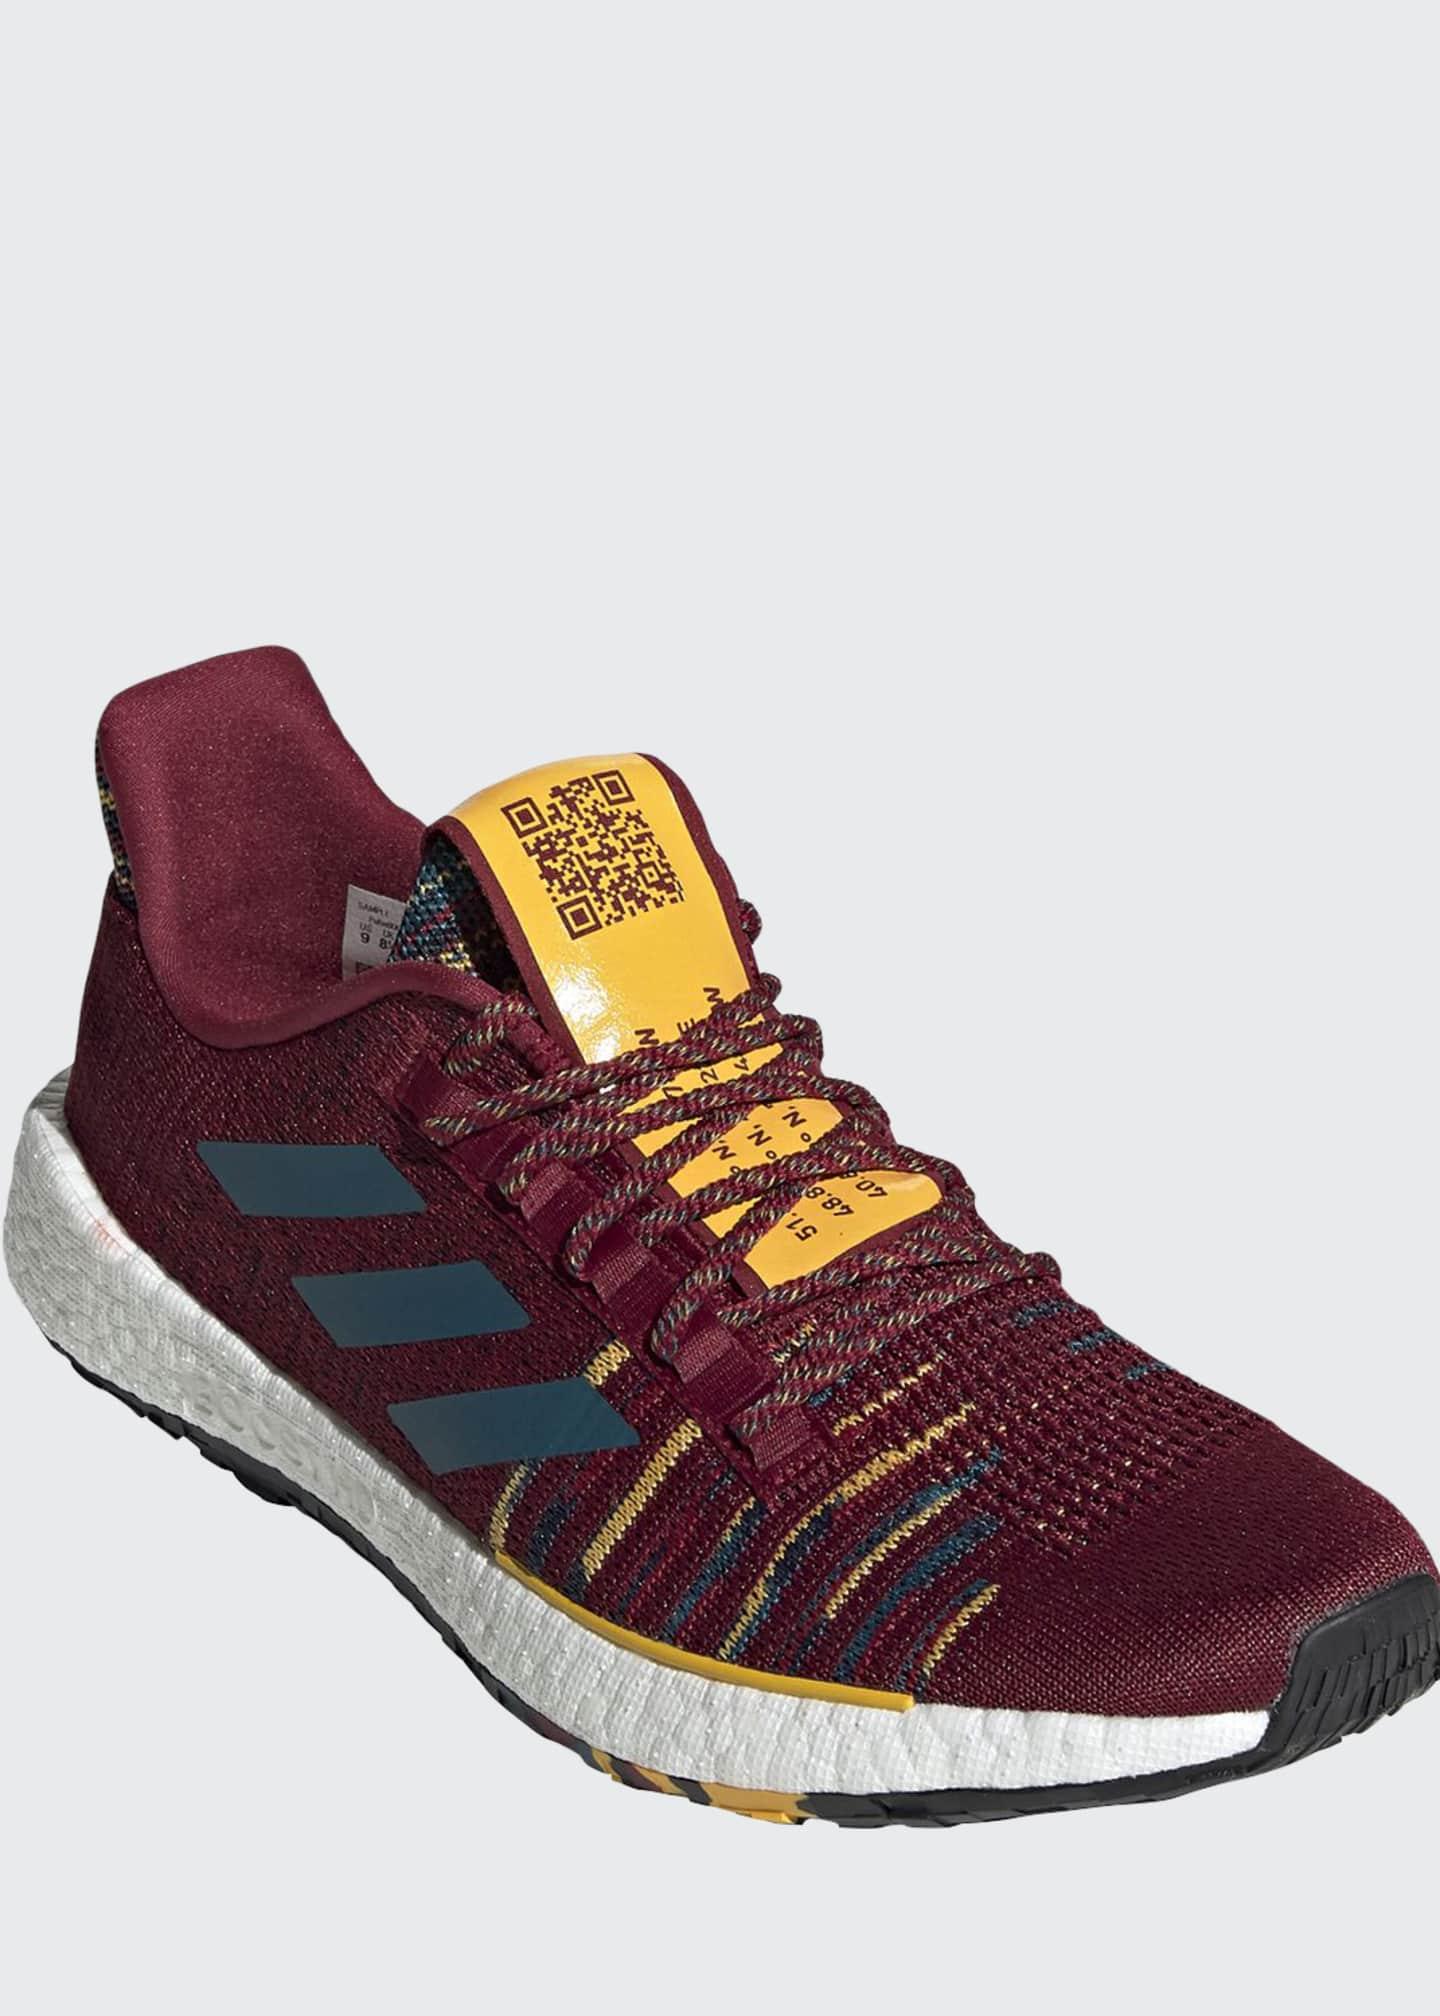 Adidas x missoni Men's PulseBoost HD Knit Running